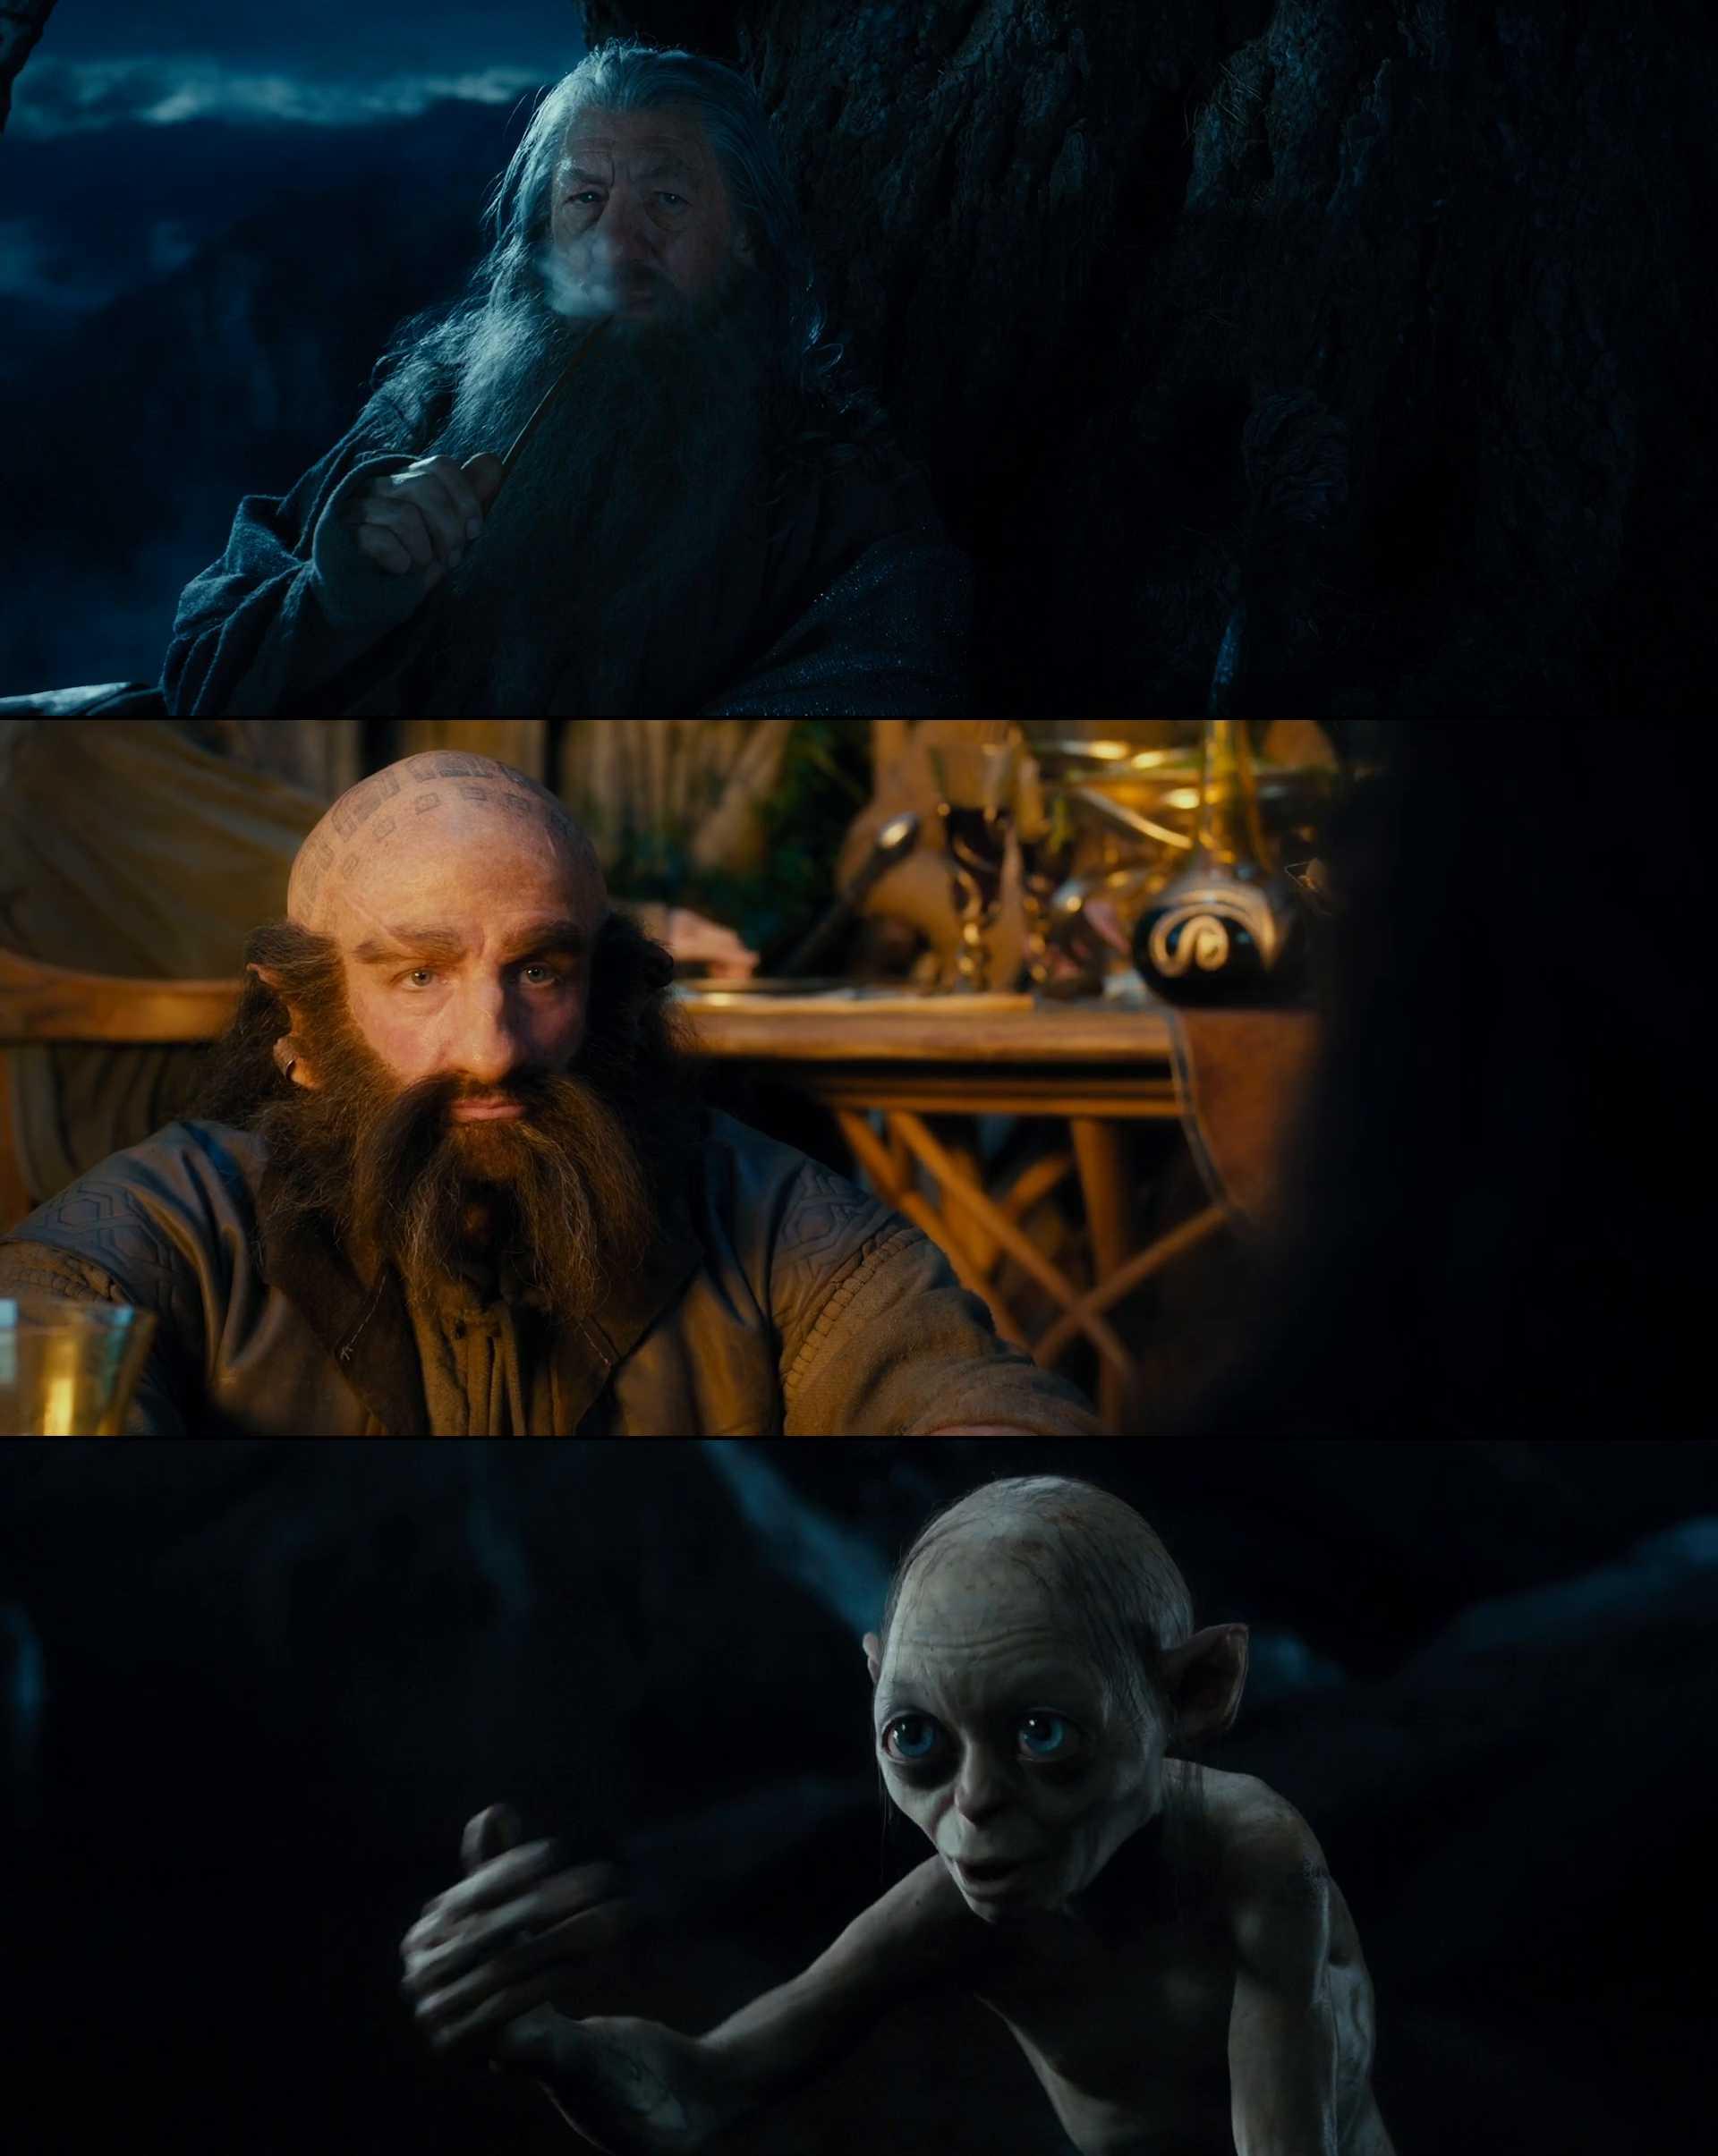 Screenshot of The Hobbit: An Unexpected Journey